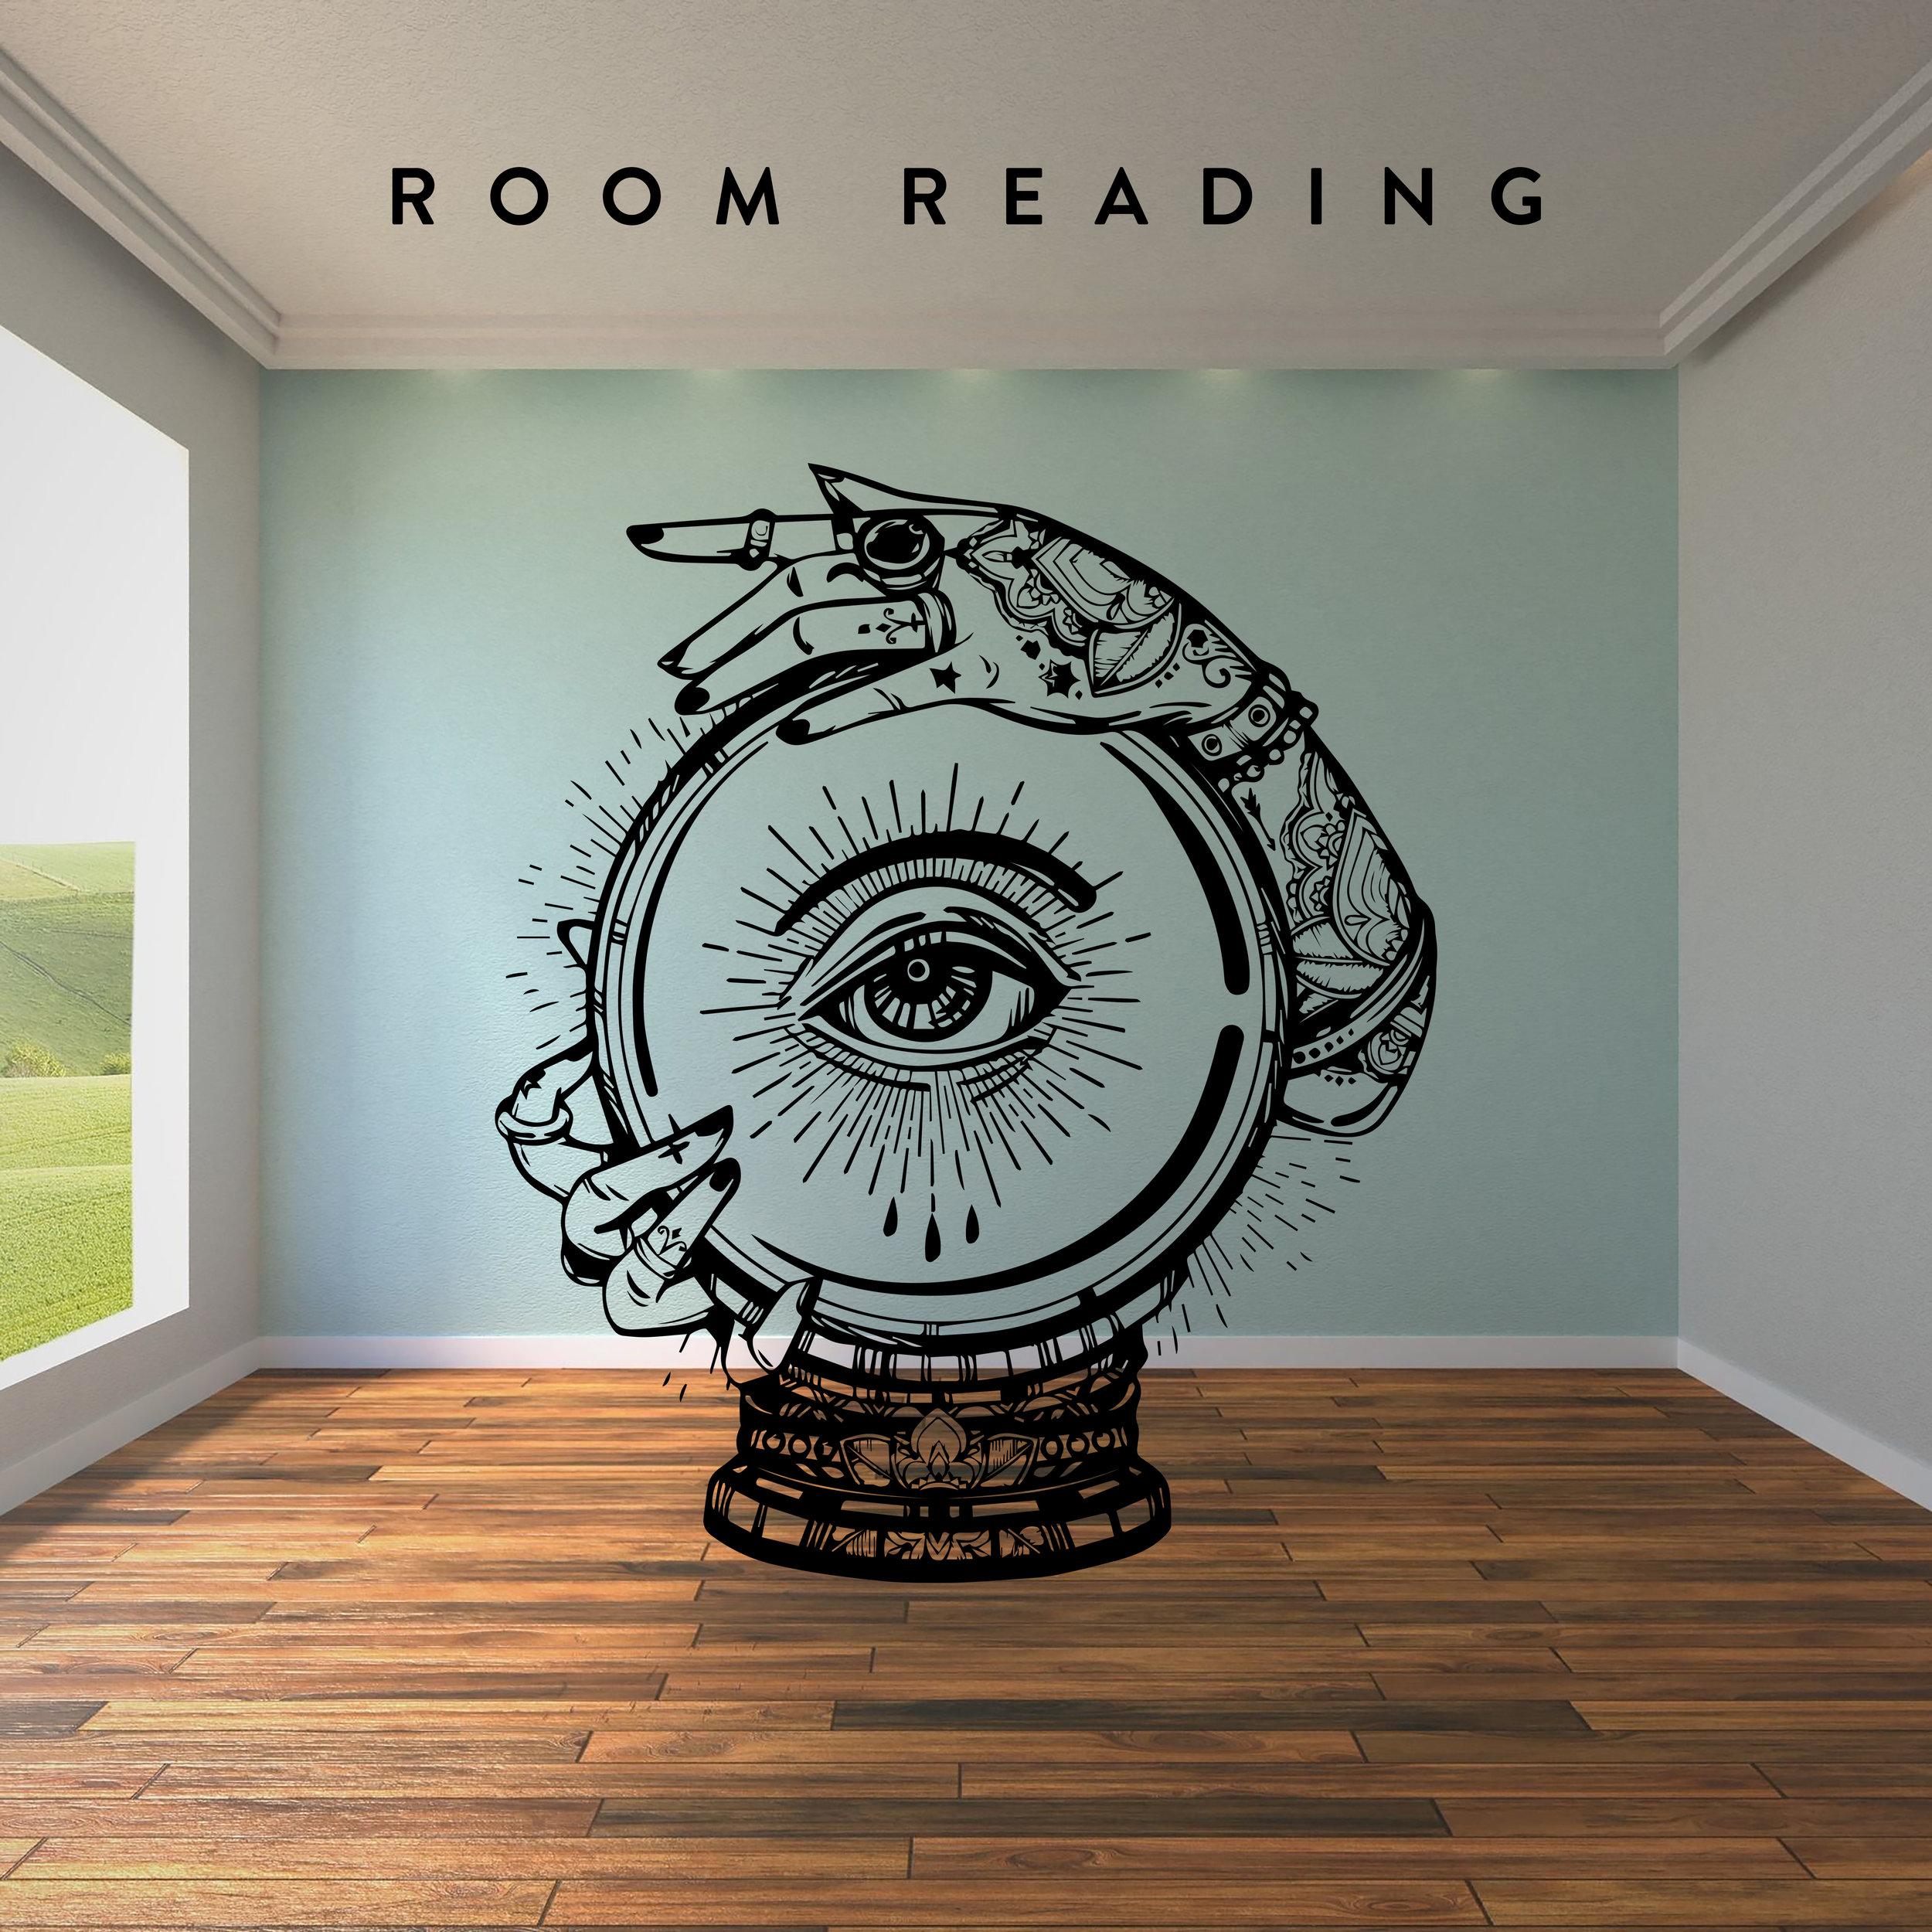 roomreading1.jpg